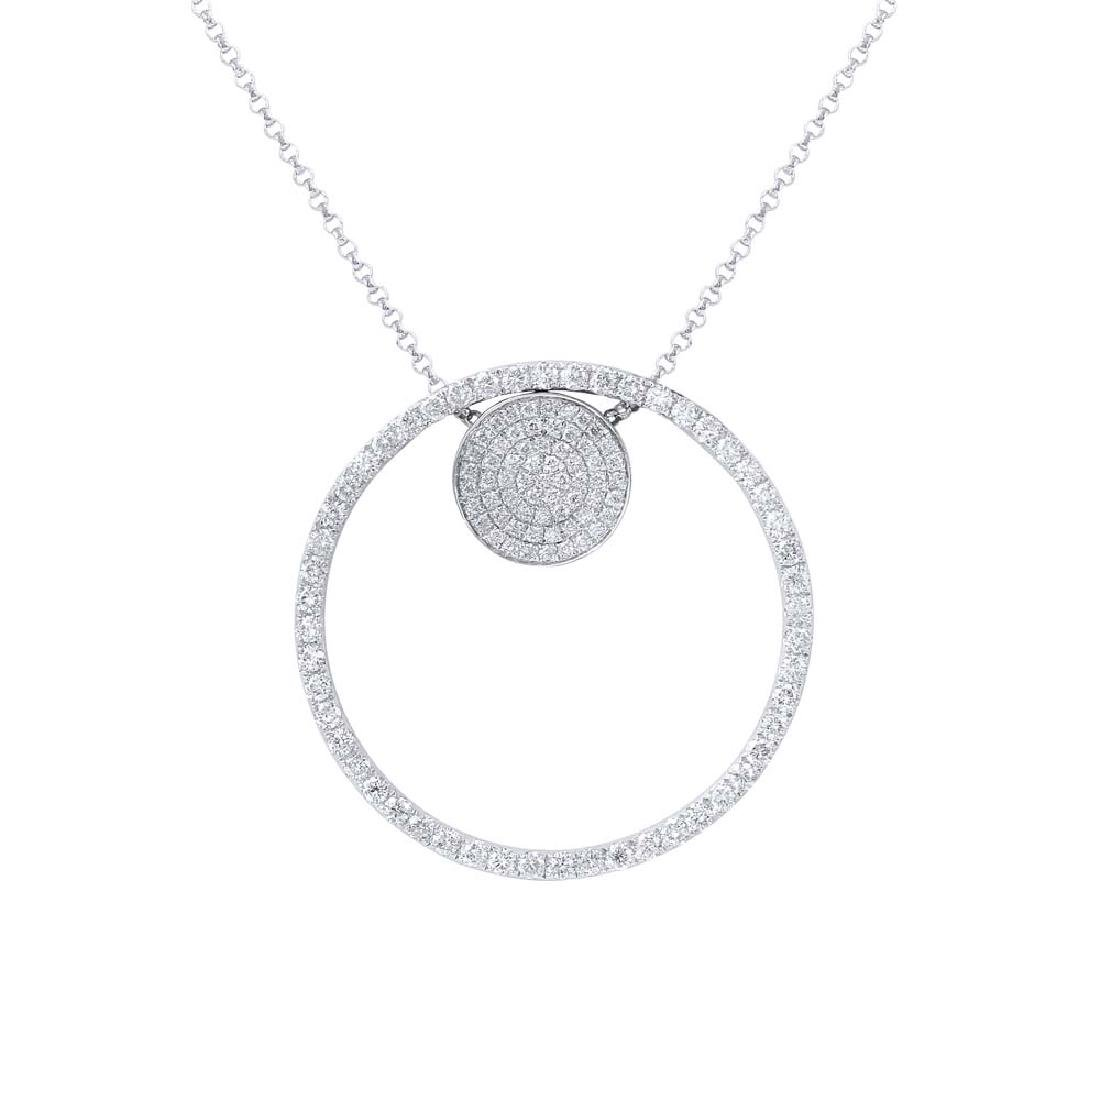 Genuine 1.08 TCW 18K White Gold Ladies Necklace